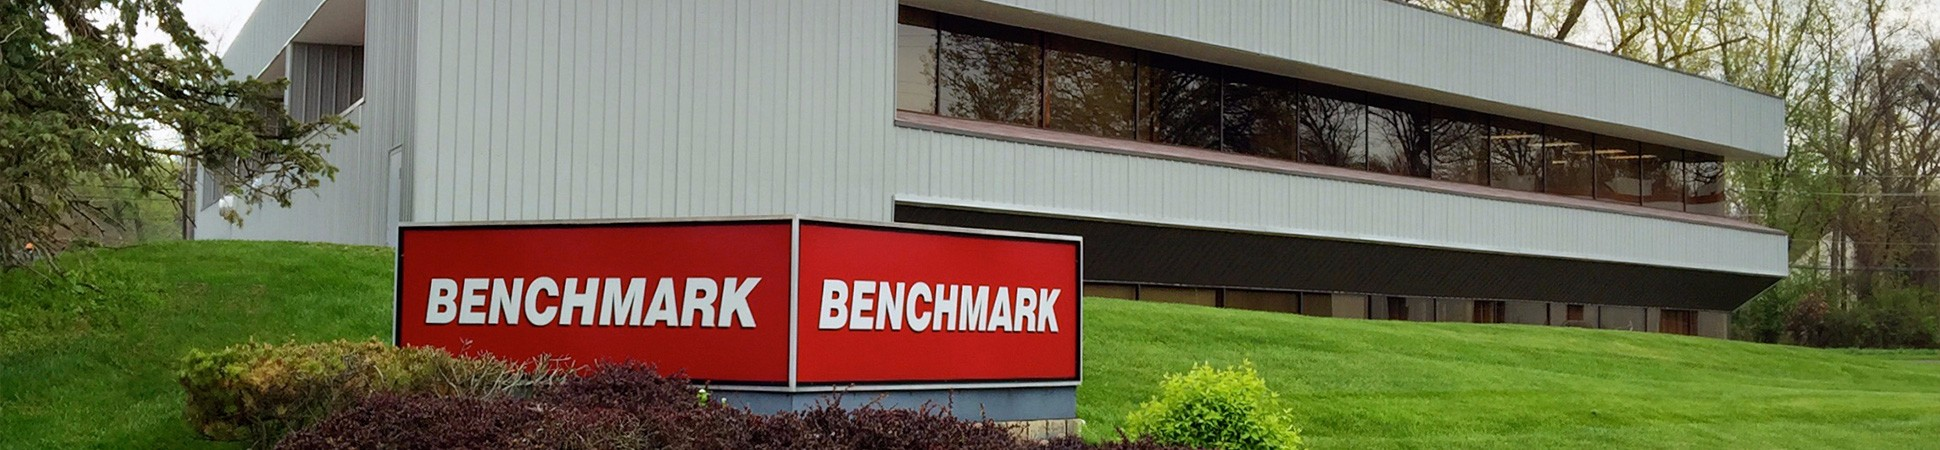 benchmark-corporate-hq